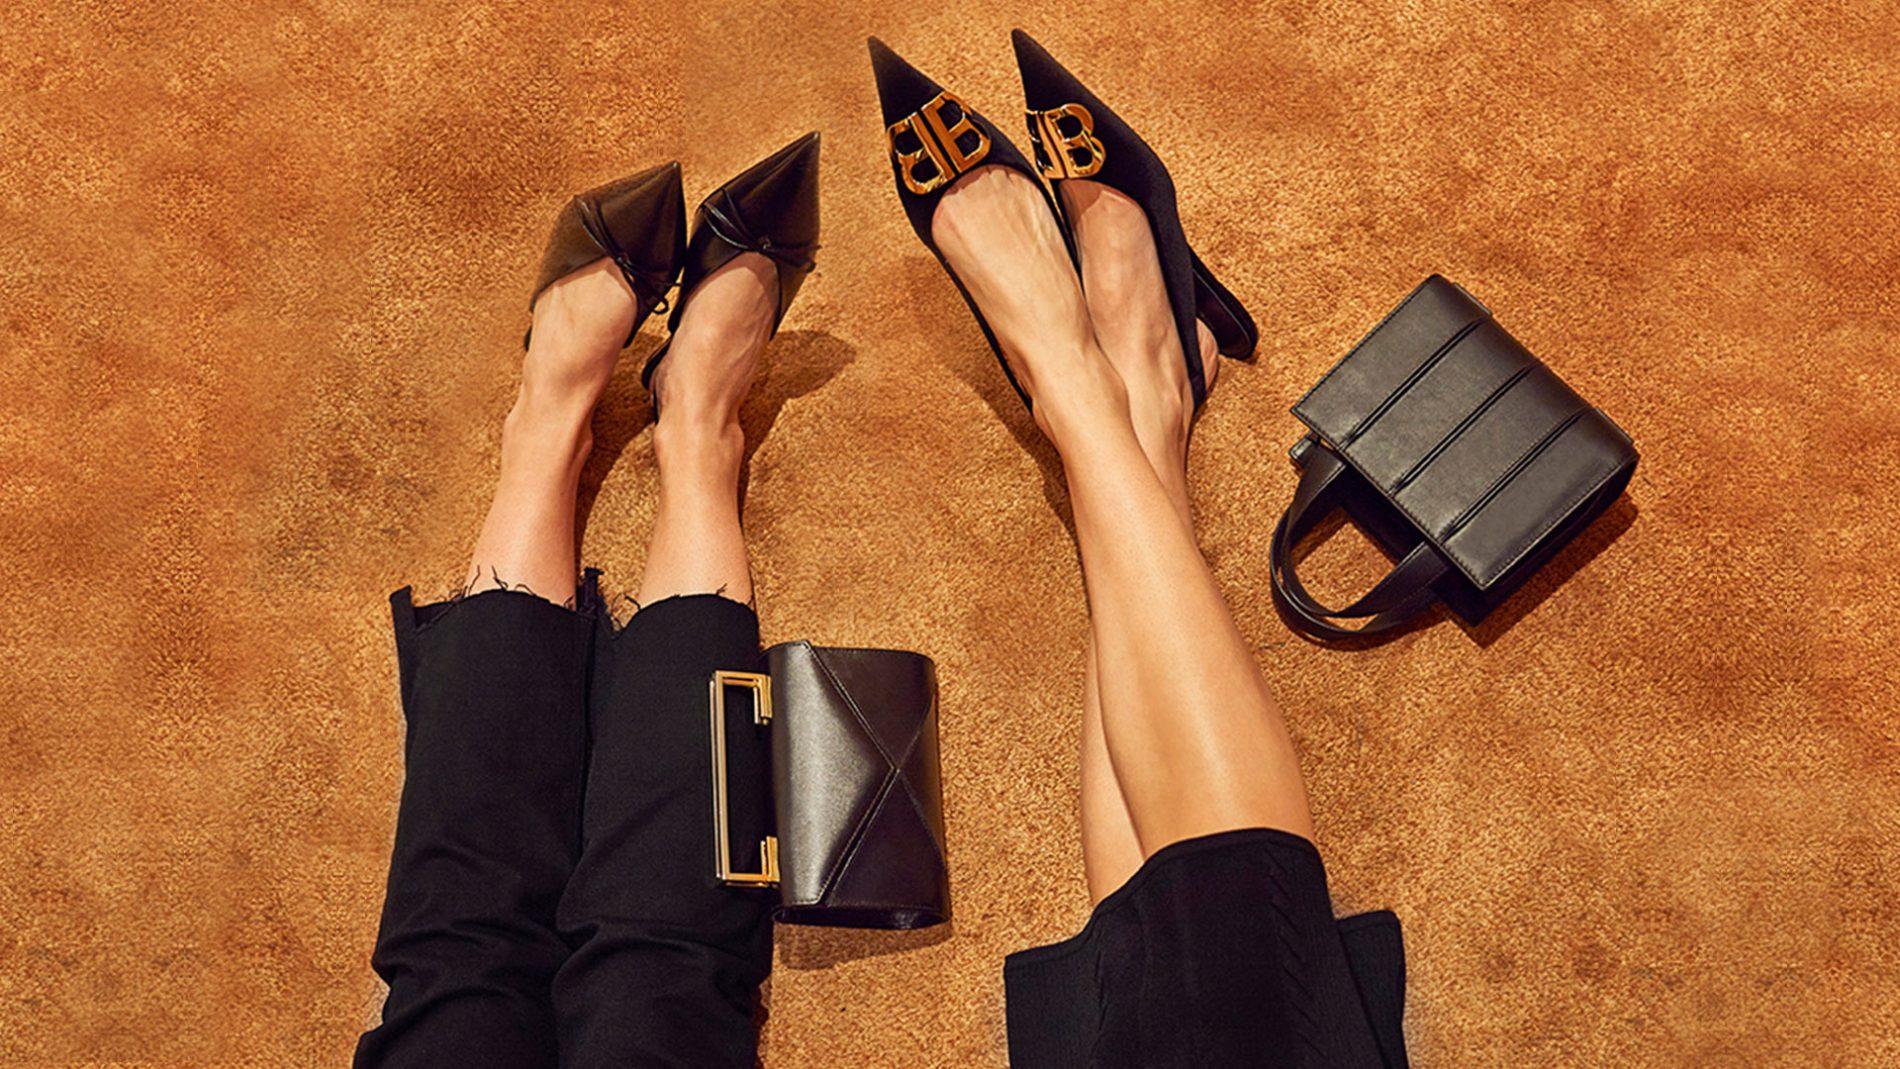 El Corte Inglés Designer Handbags Shoes Balenciaga Rag & Bone Max Mara FW18 AW18